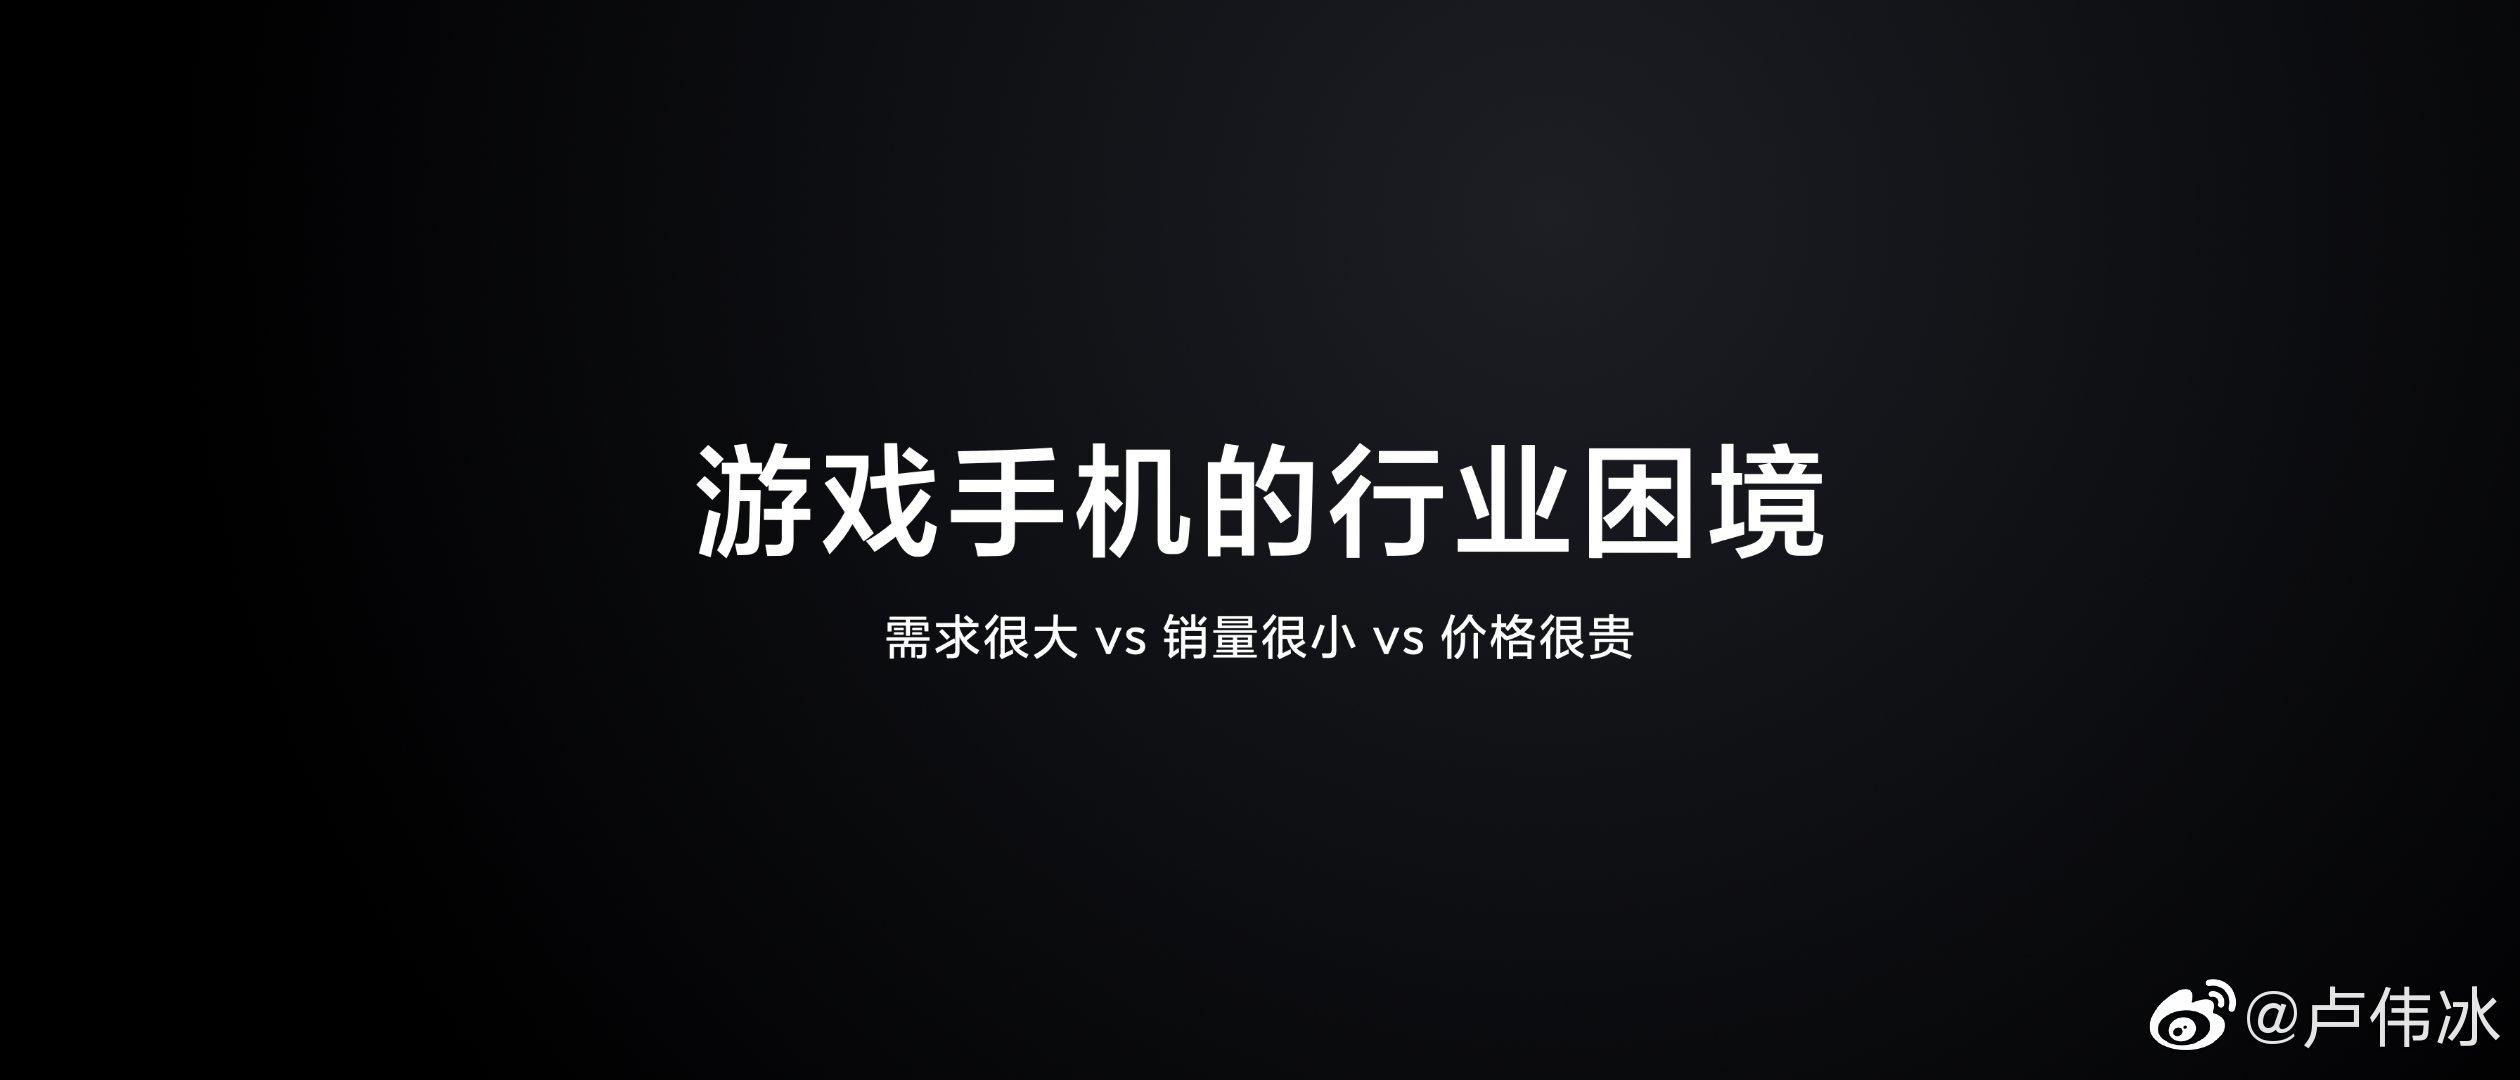 Redmi经理卢伟冰谈游戏手机:需求大 销量小 价格贵